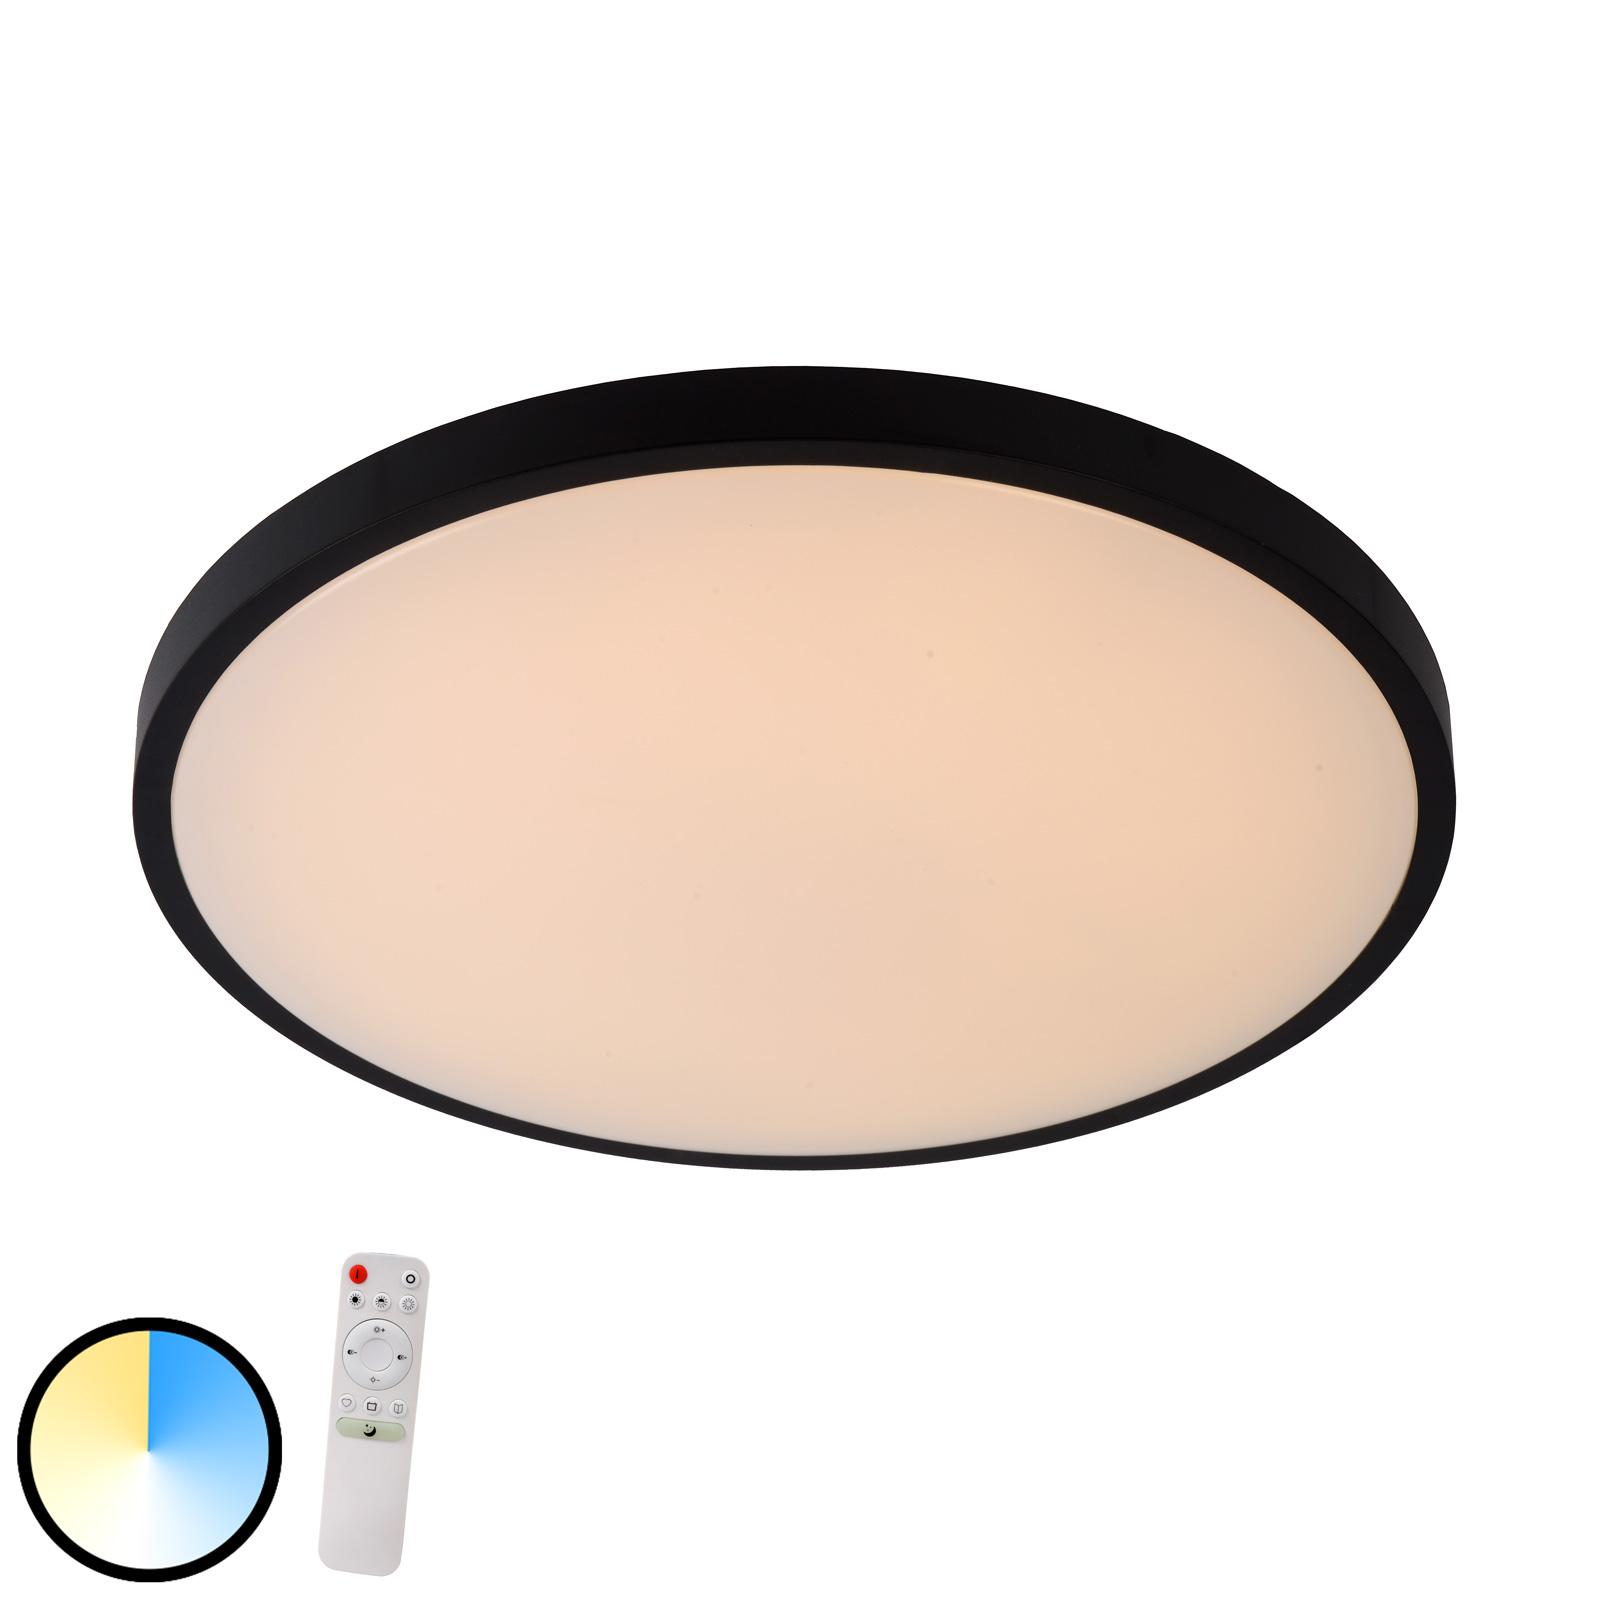 Polaris LED-taklampe dim to warm Ø 45,7 cm